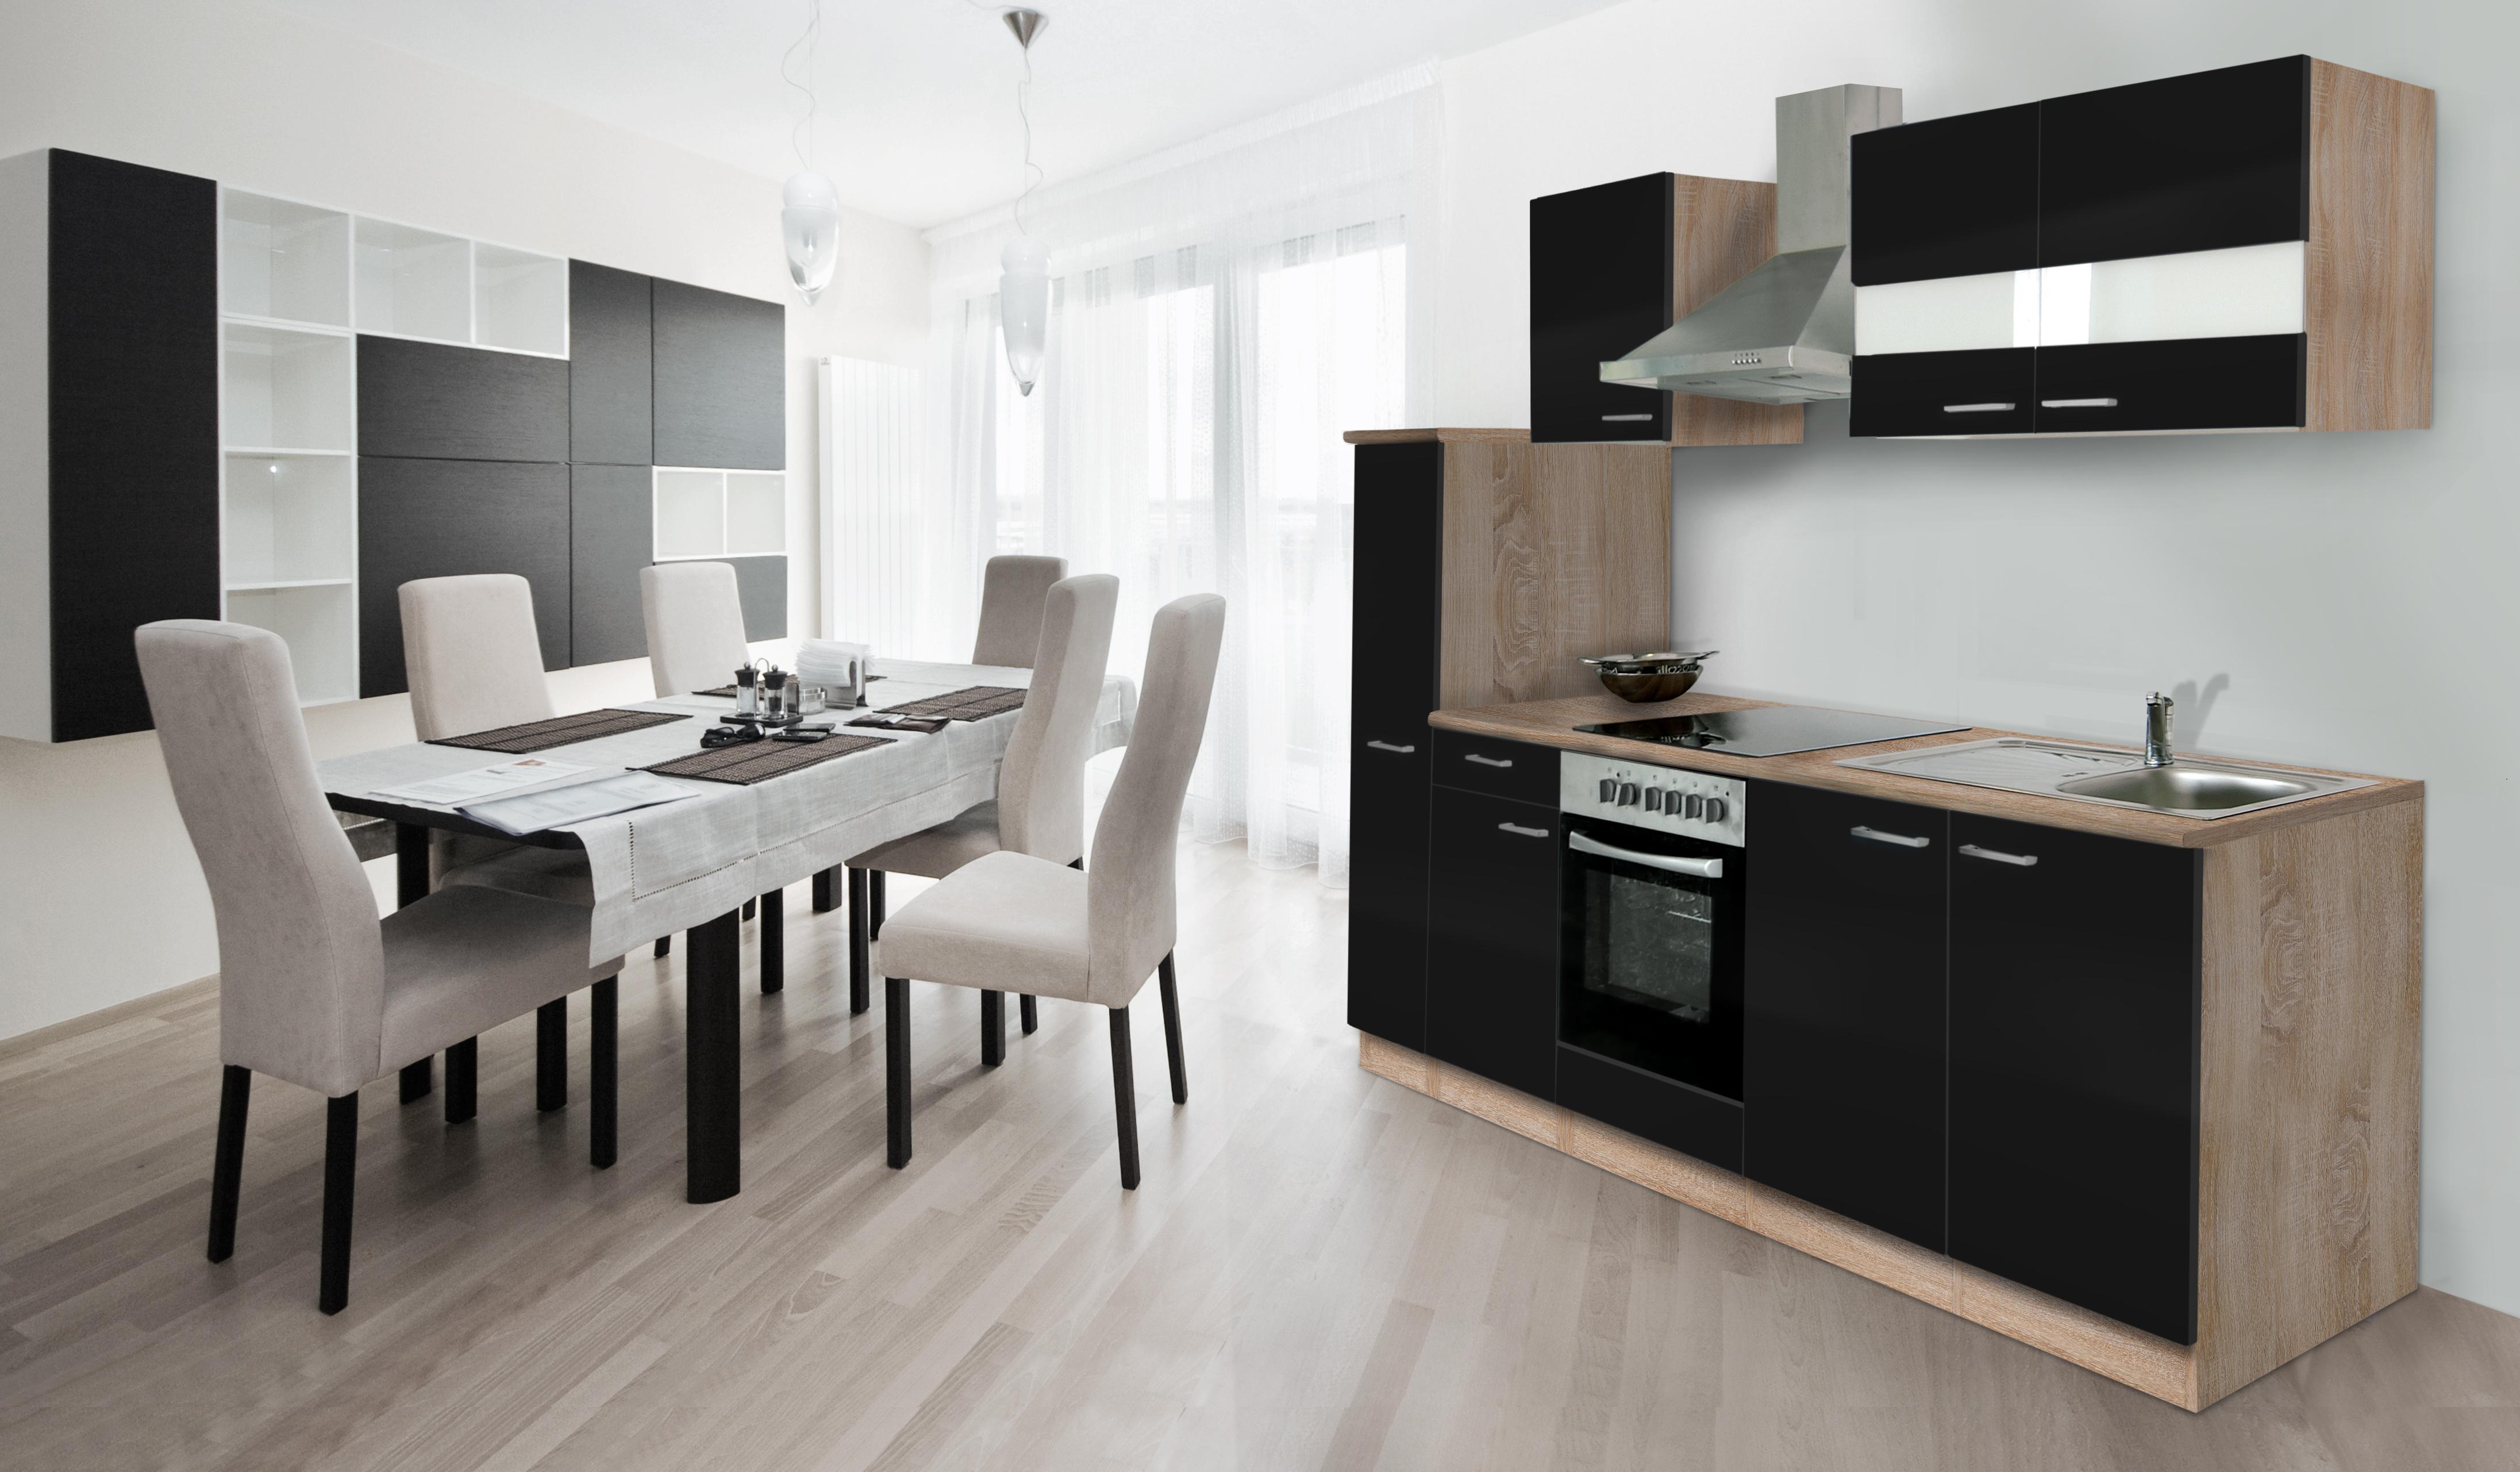 k che k chenzeile k chenblock einbauk che 240 cm eiche s gerau schwarz respekta ebay. Black Bedroom Furniture Sets. Home Design Ideas